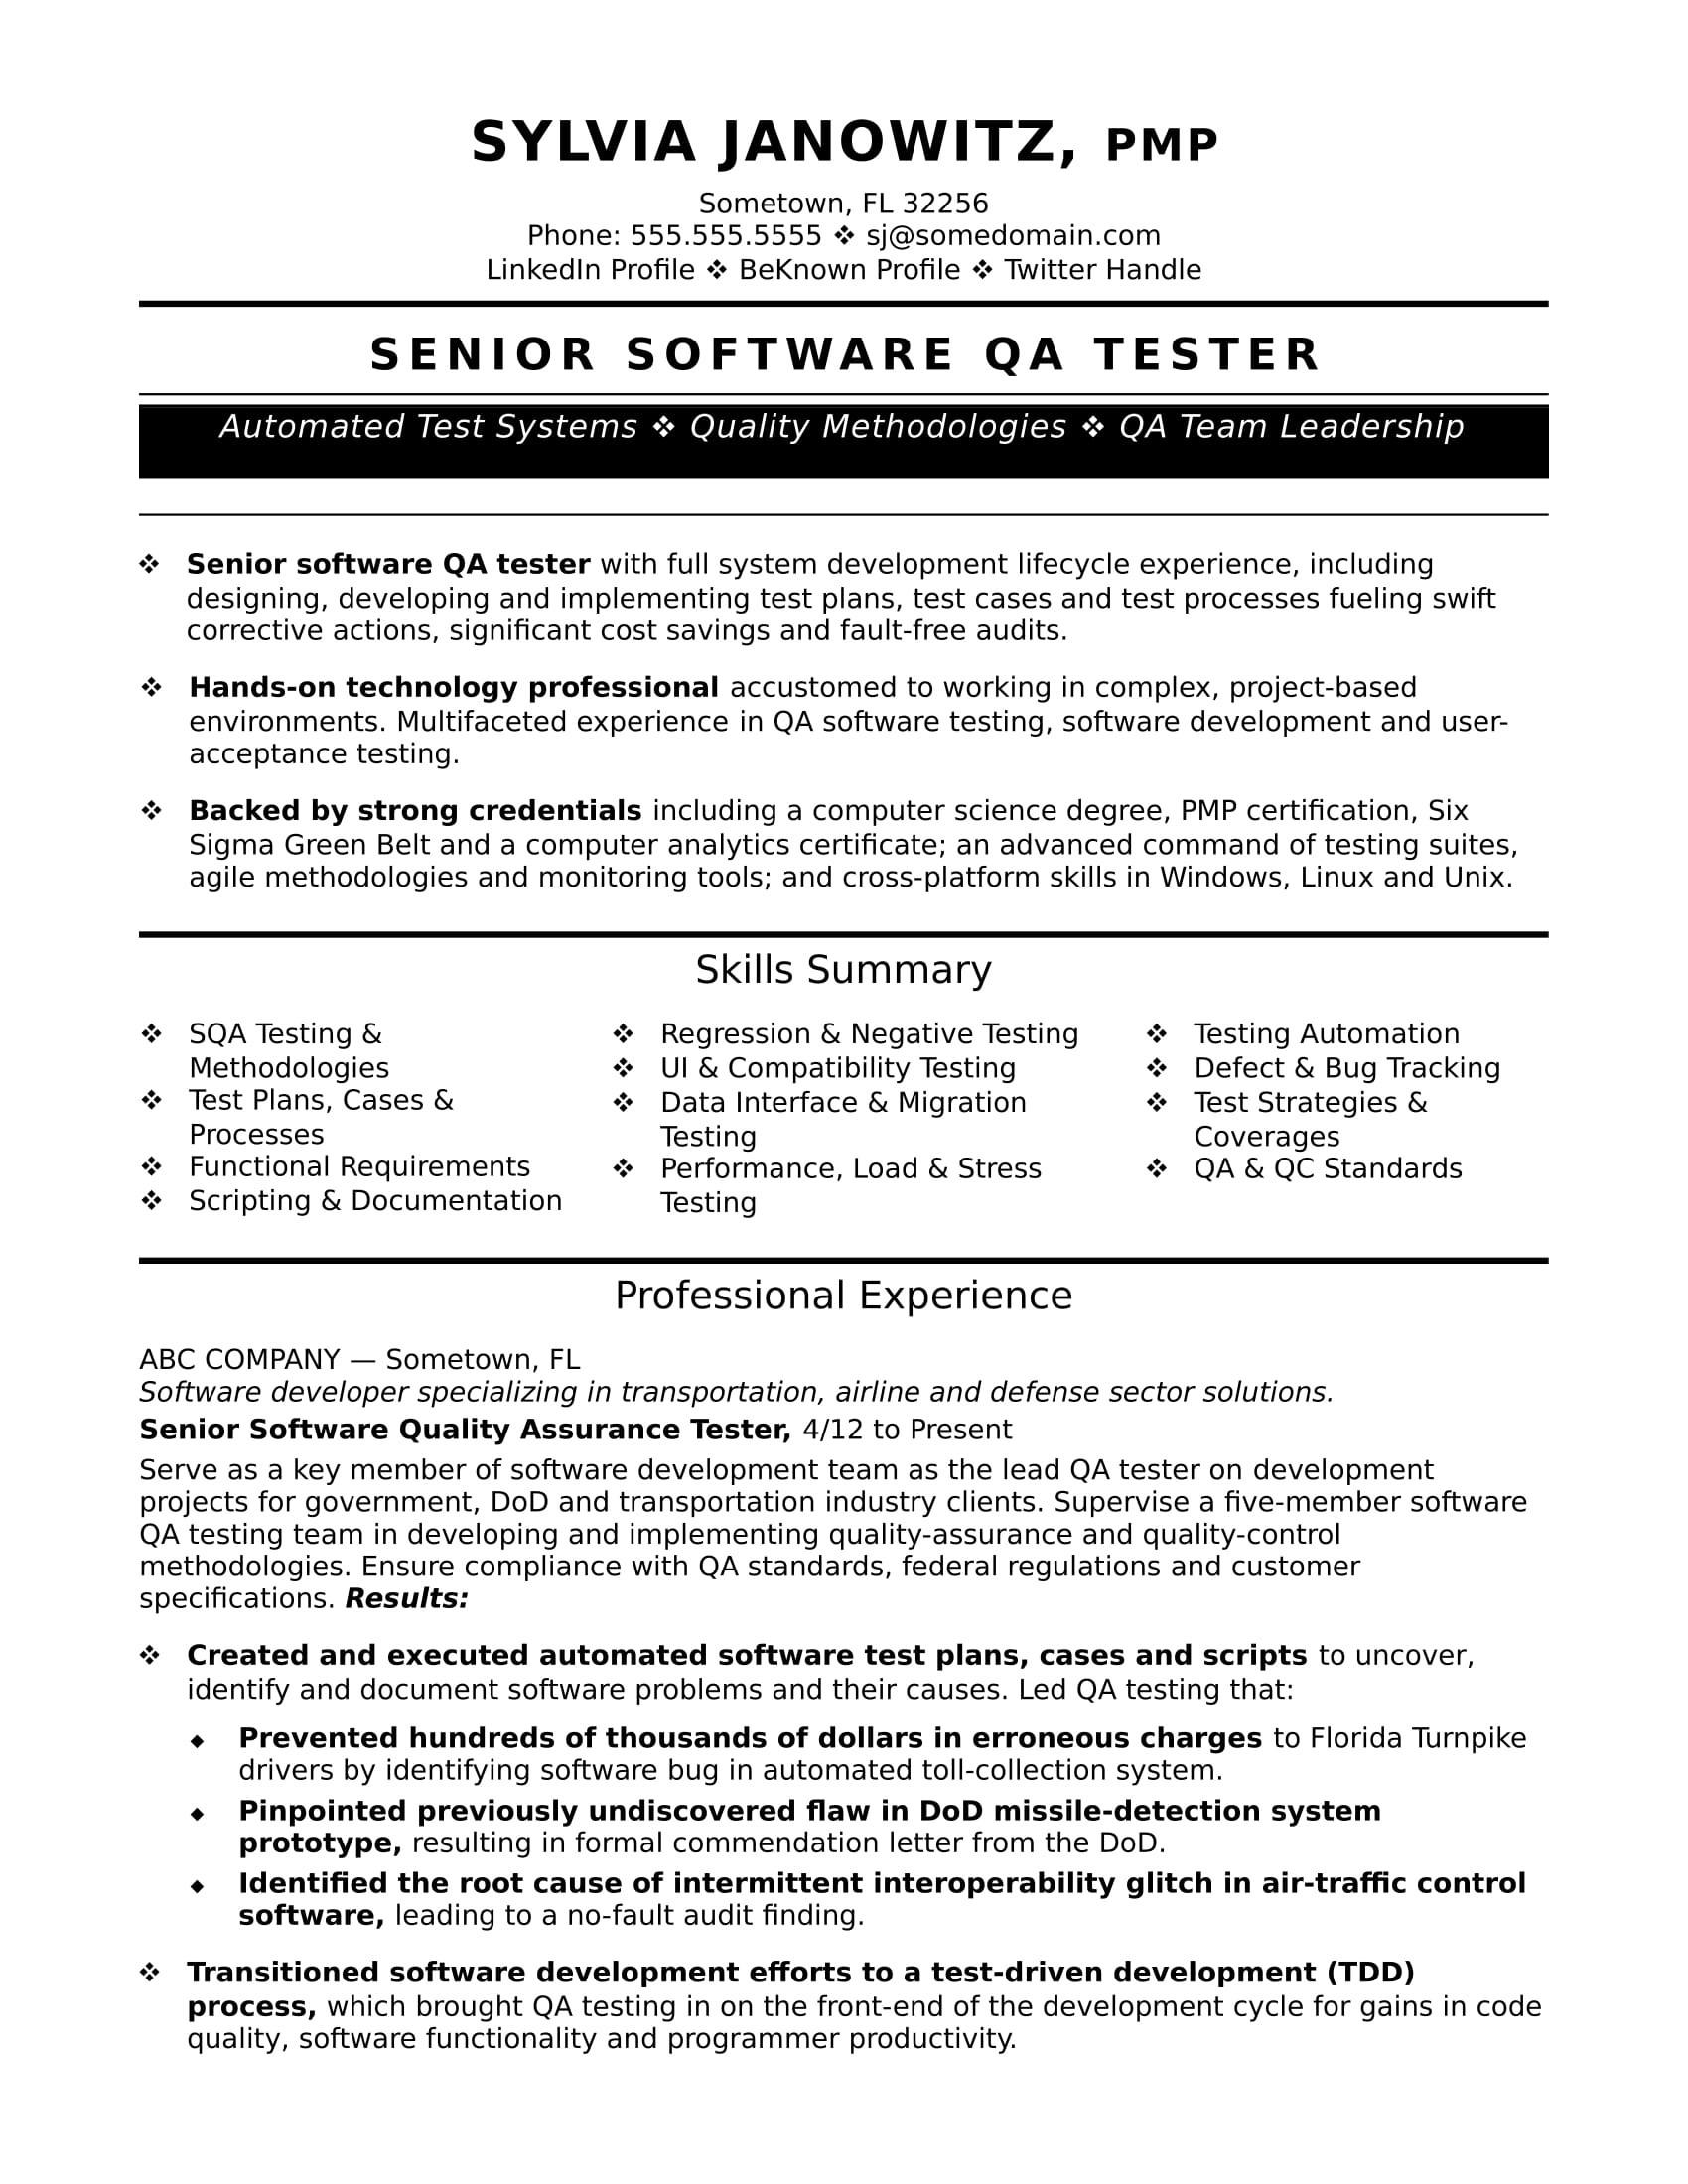 Sample Resume for Qa Analyst Experienced Qa software Tester Resume Sample